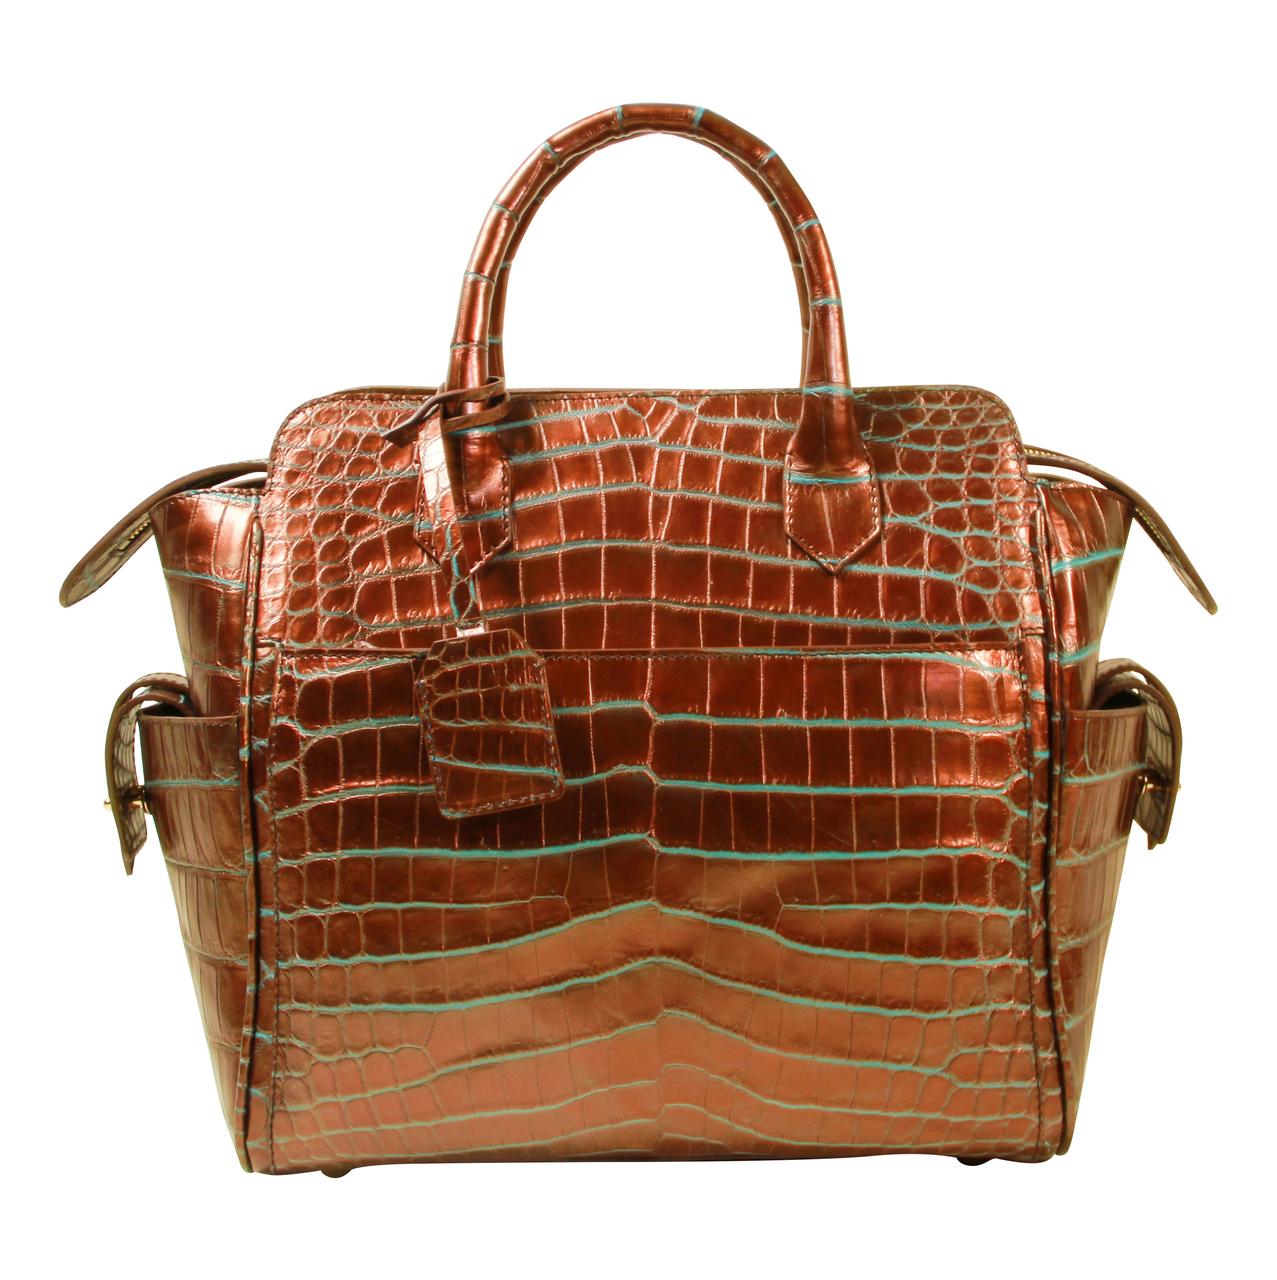 Trapeze Leveler - Nile Crocodile Satchel Bag - Two Tone Bronze